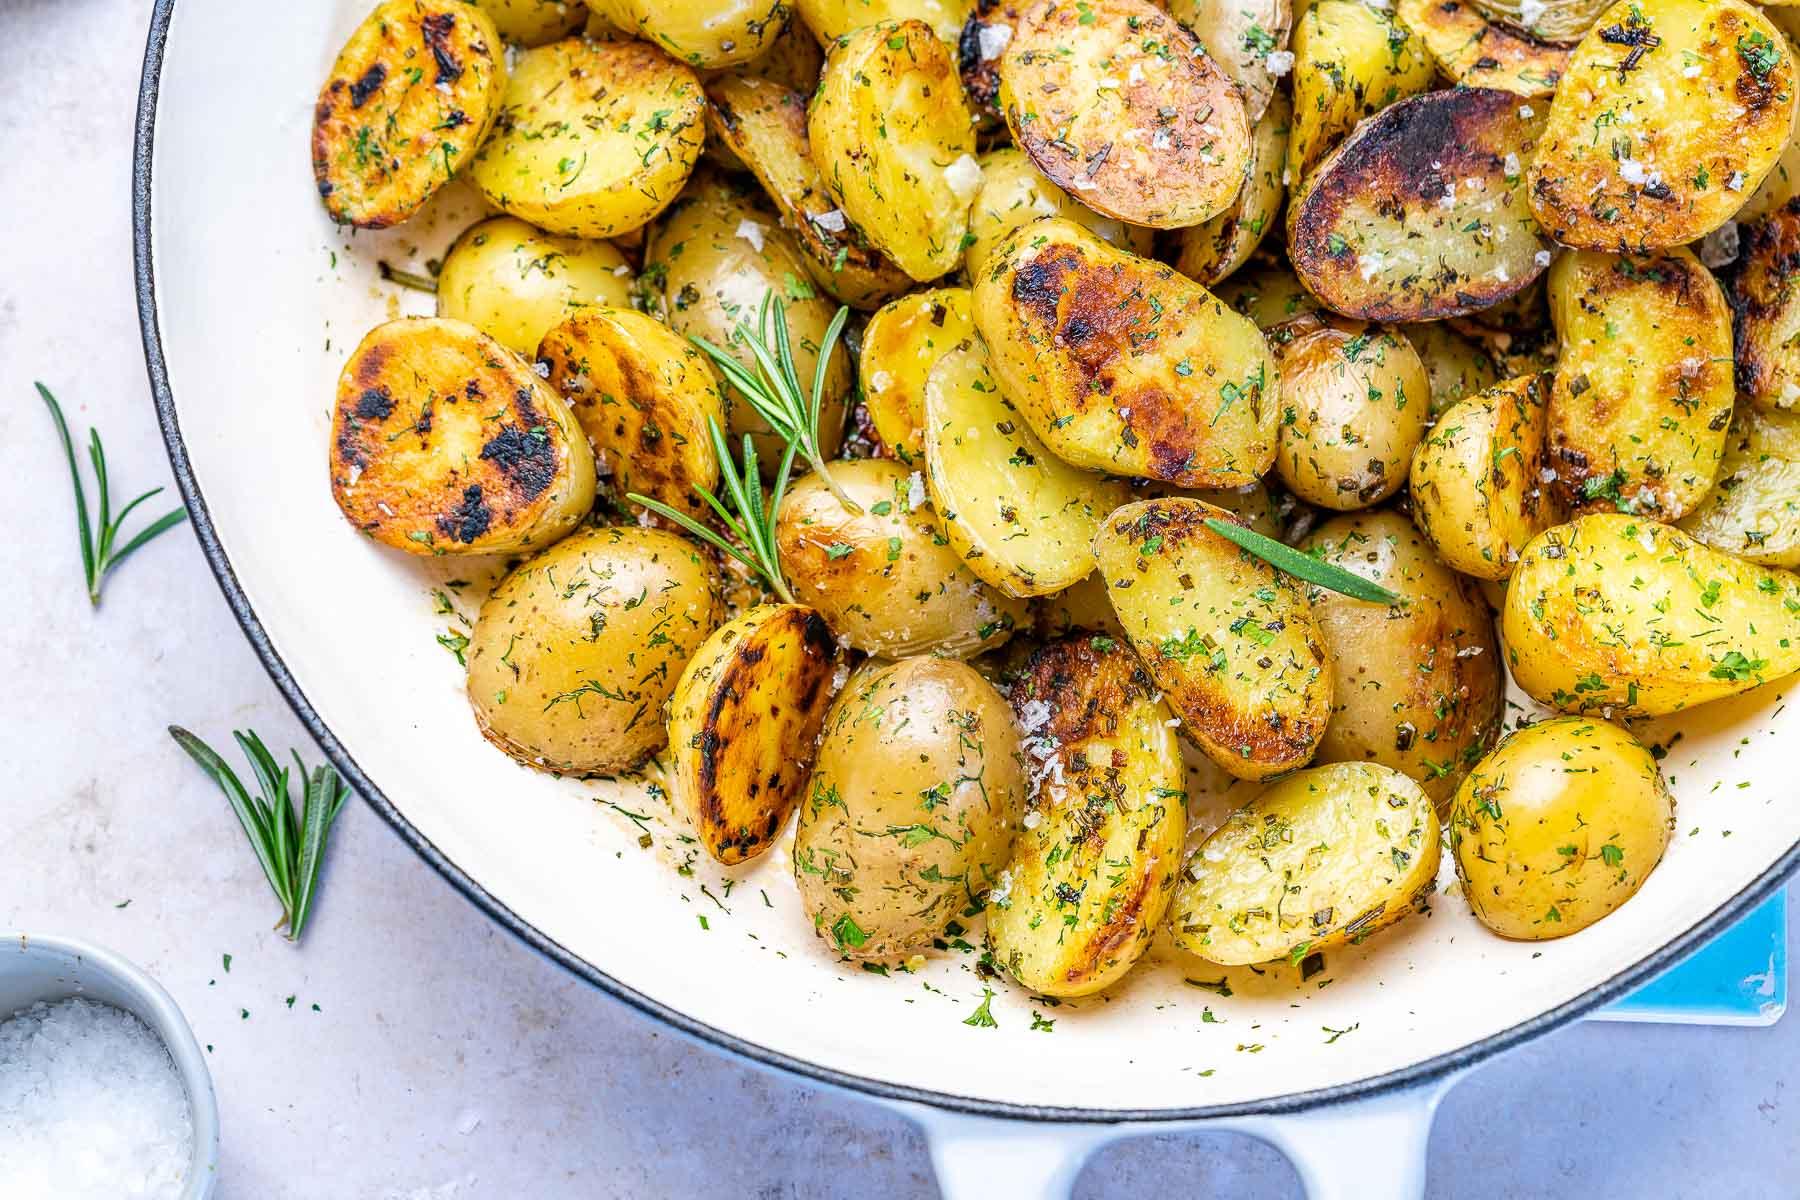 cartofi inabusiti in tigaie cu usturoi si verdeturi si sare deasupra